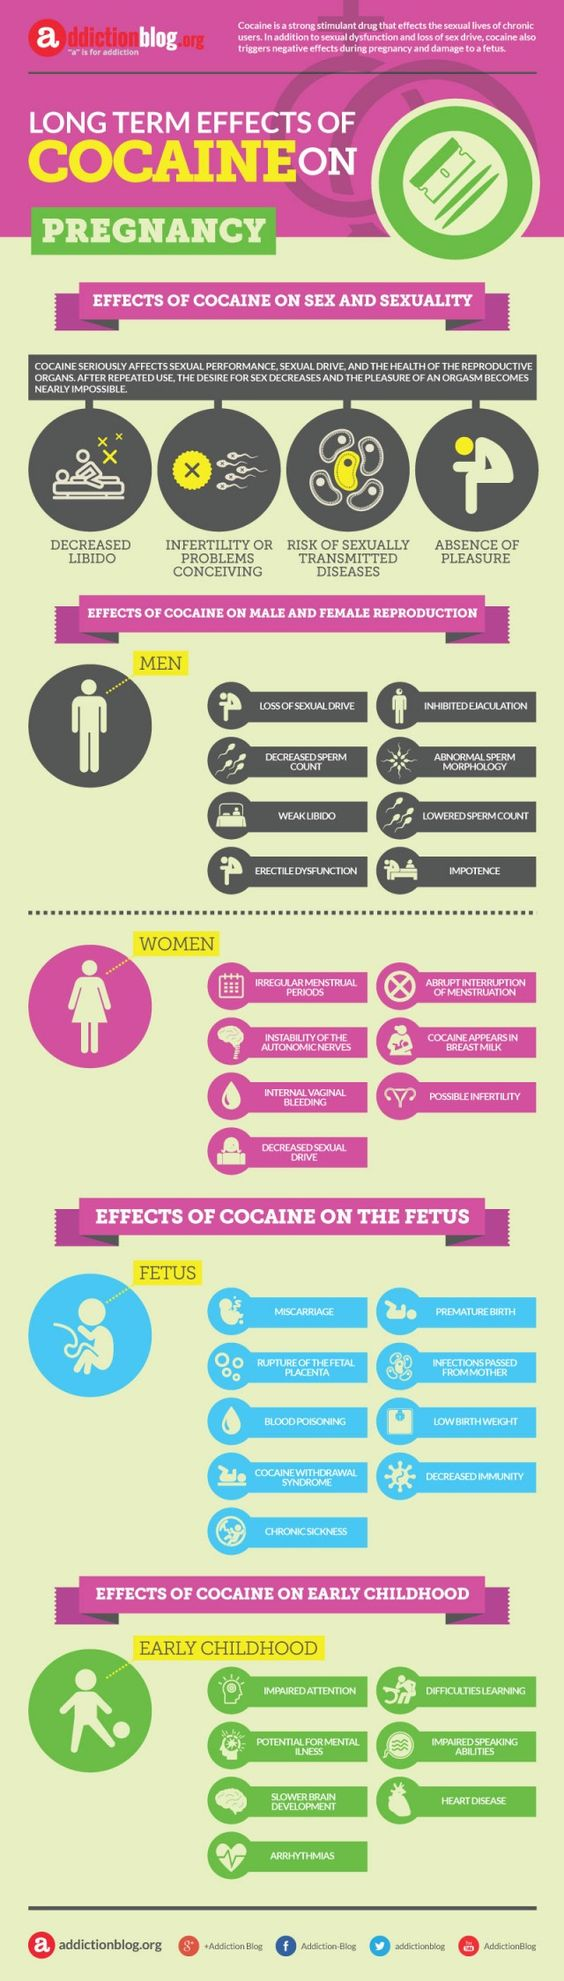 TOP Erectile Dysfunction Treatment Pills Supplements